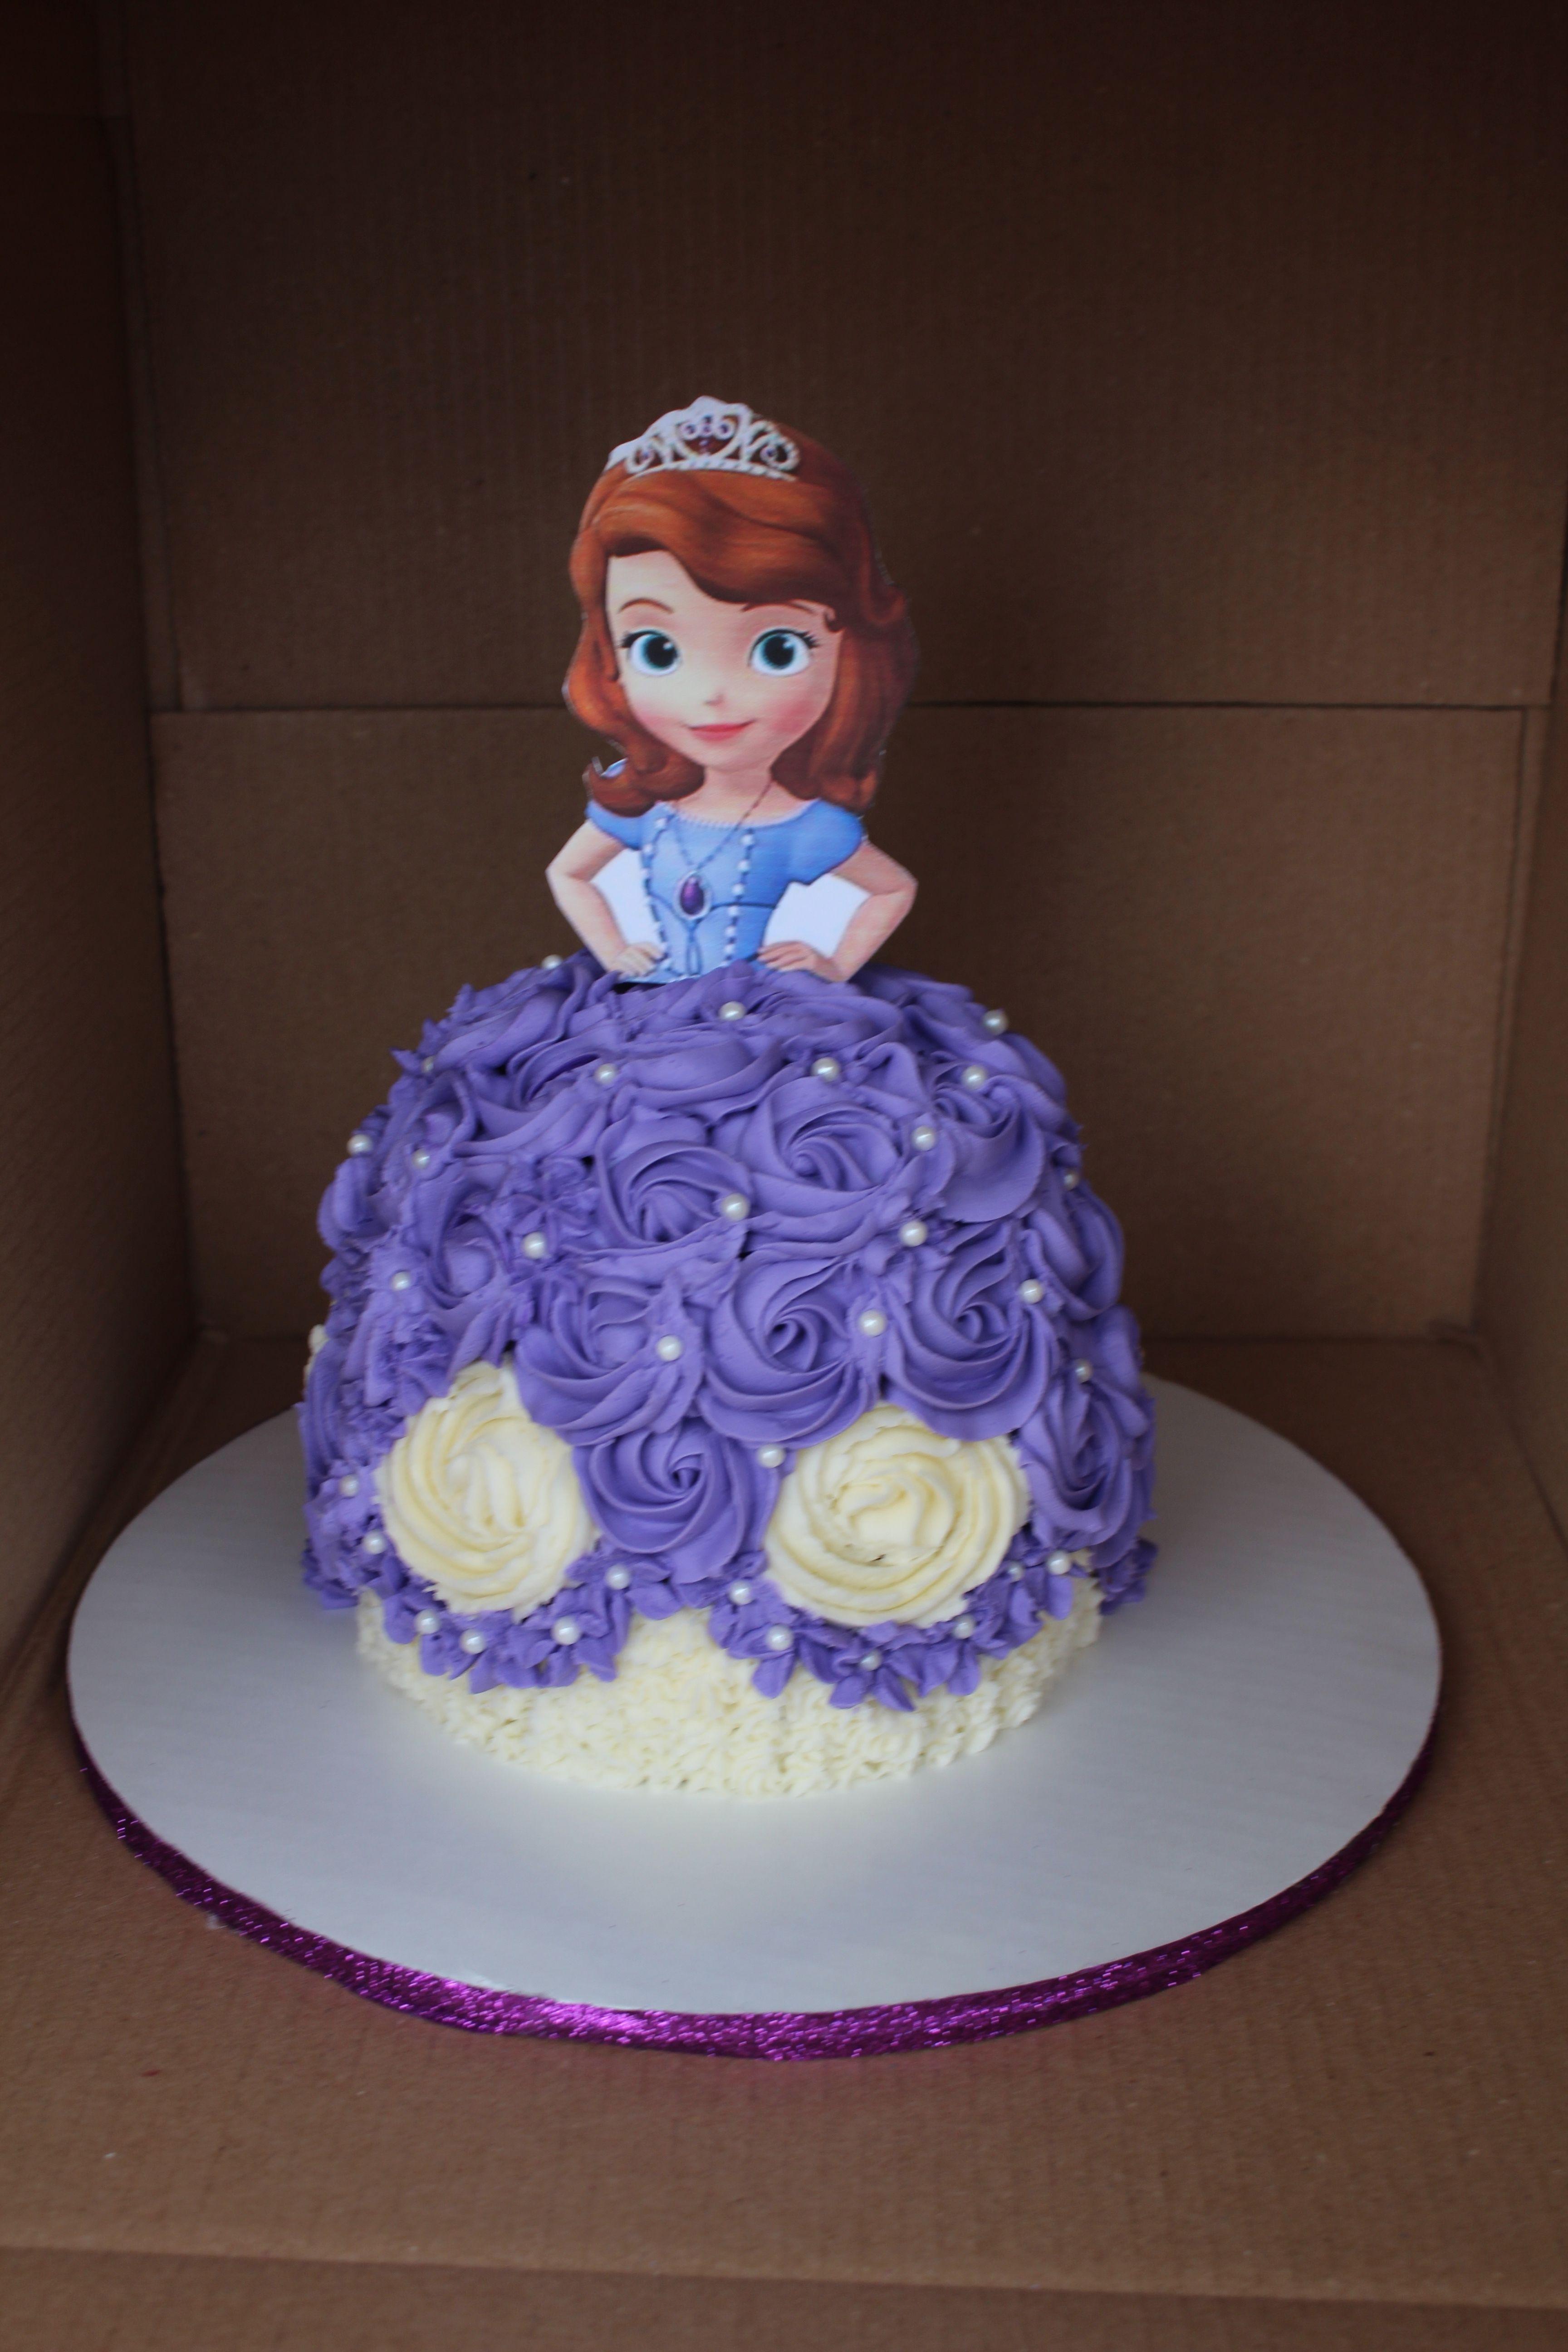 Princess sophia doll cake doll cake bakery cakes